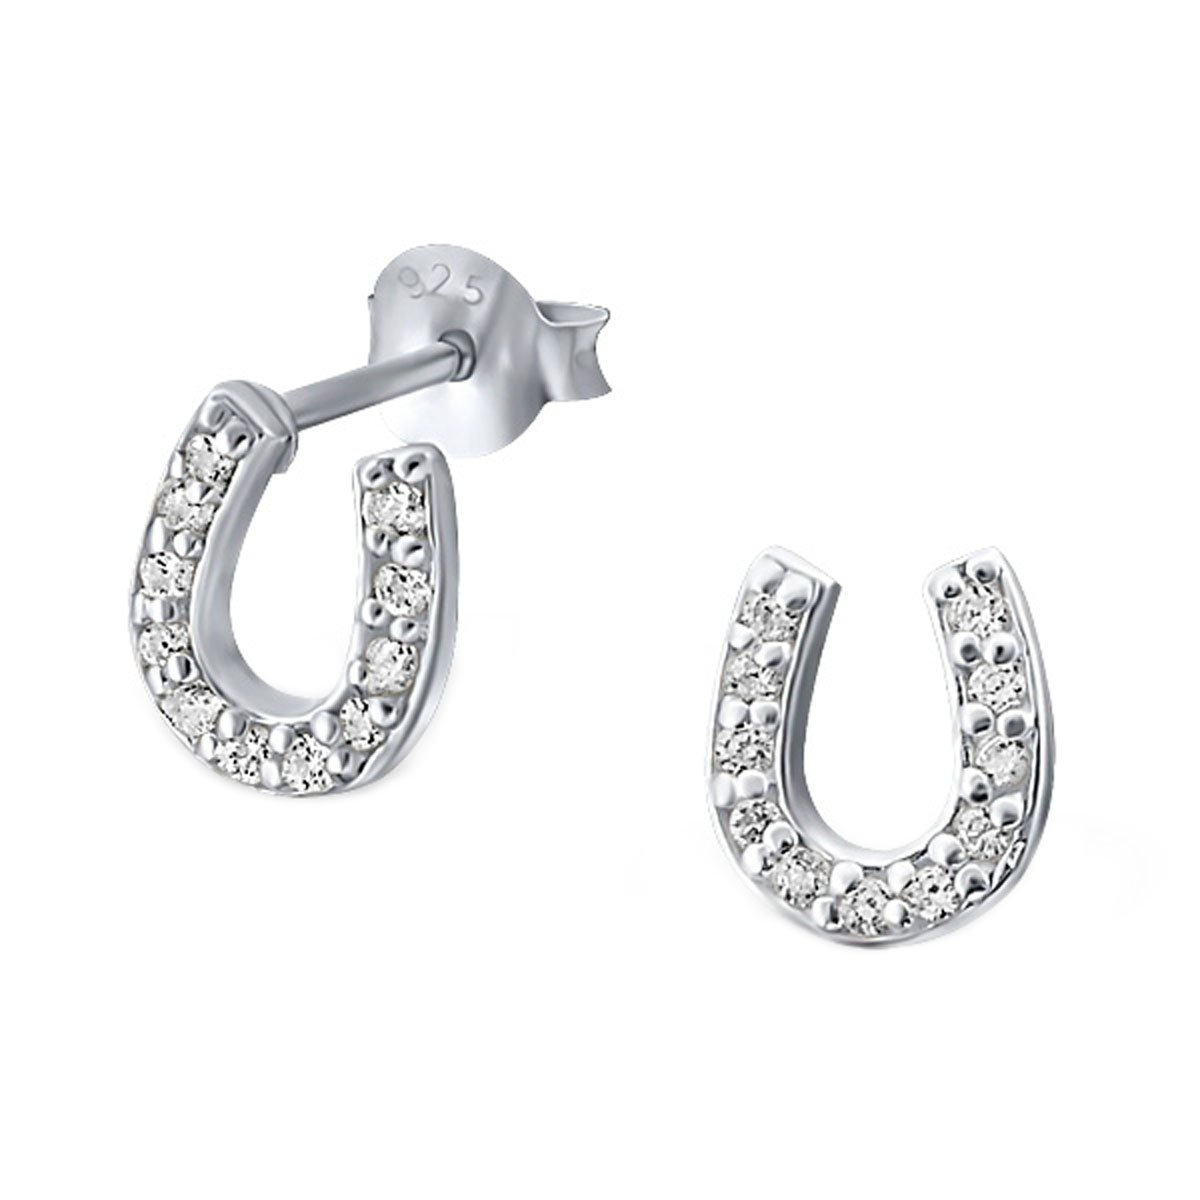 Sterling Silver CZ Horseshoe Earrings (E18403)